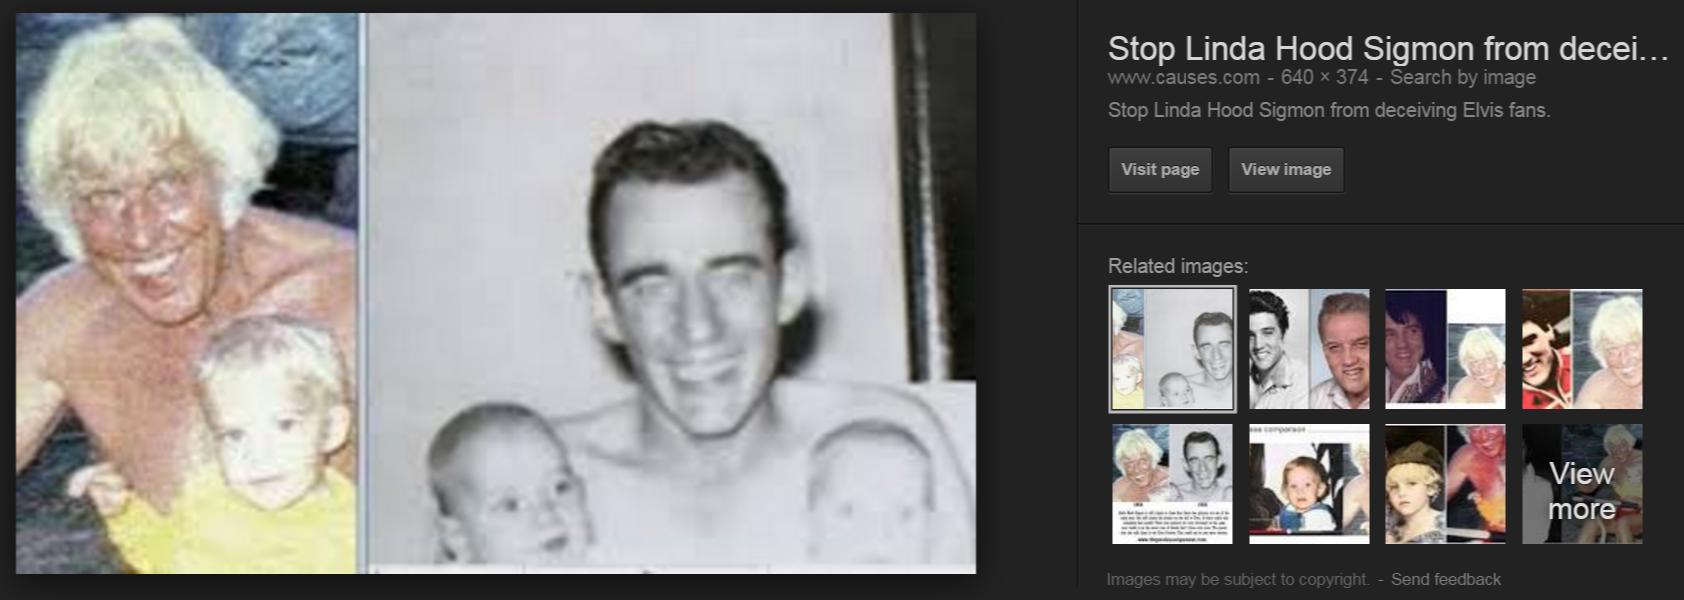 linda sigmond hood s debunked elvis photos Google Search 2